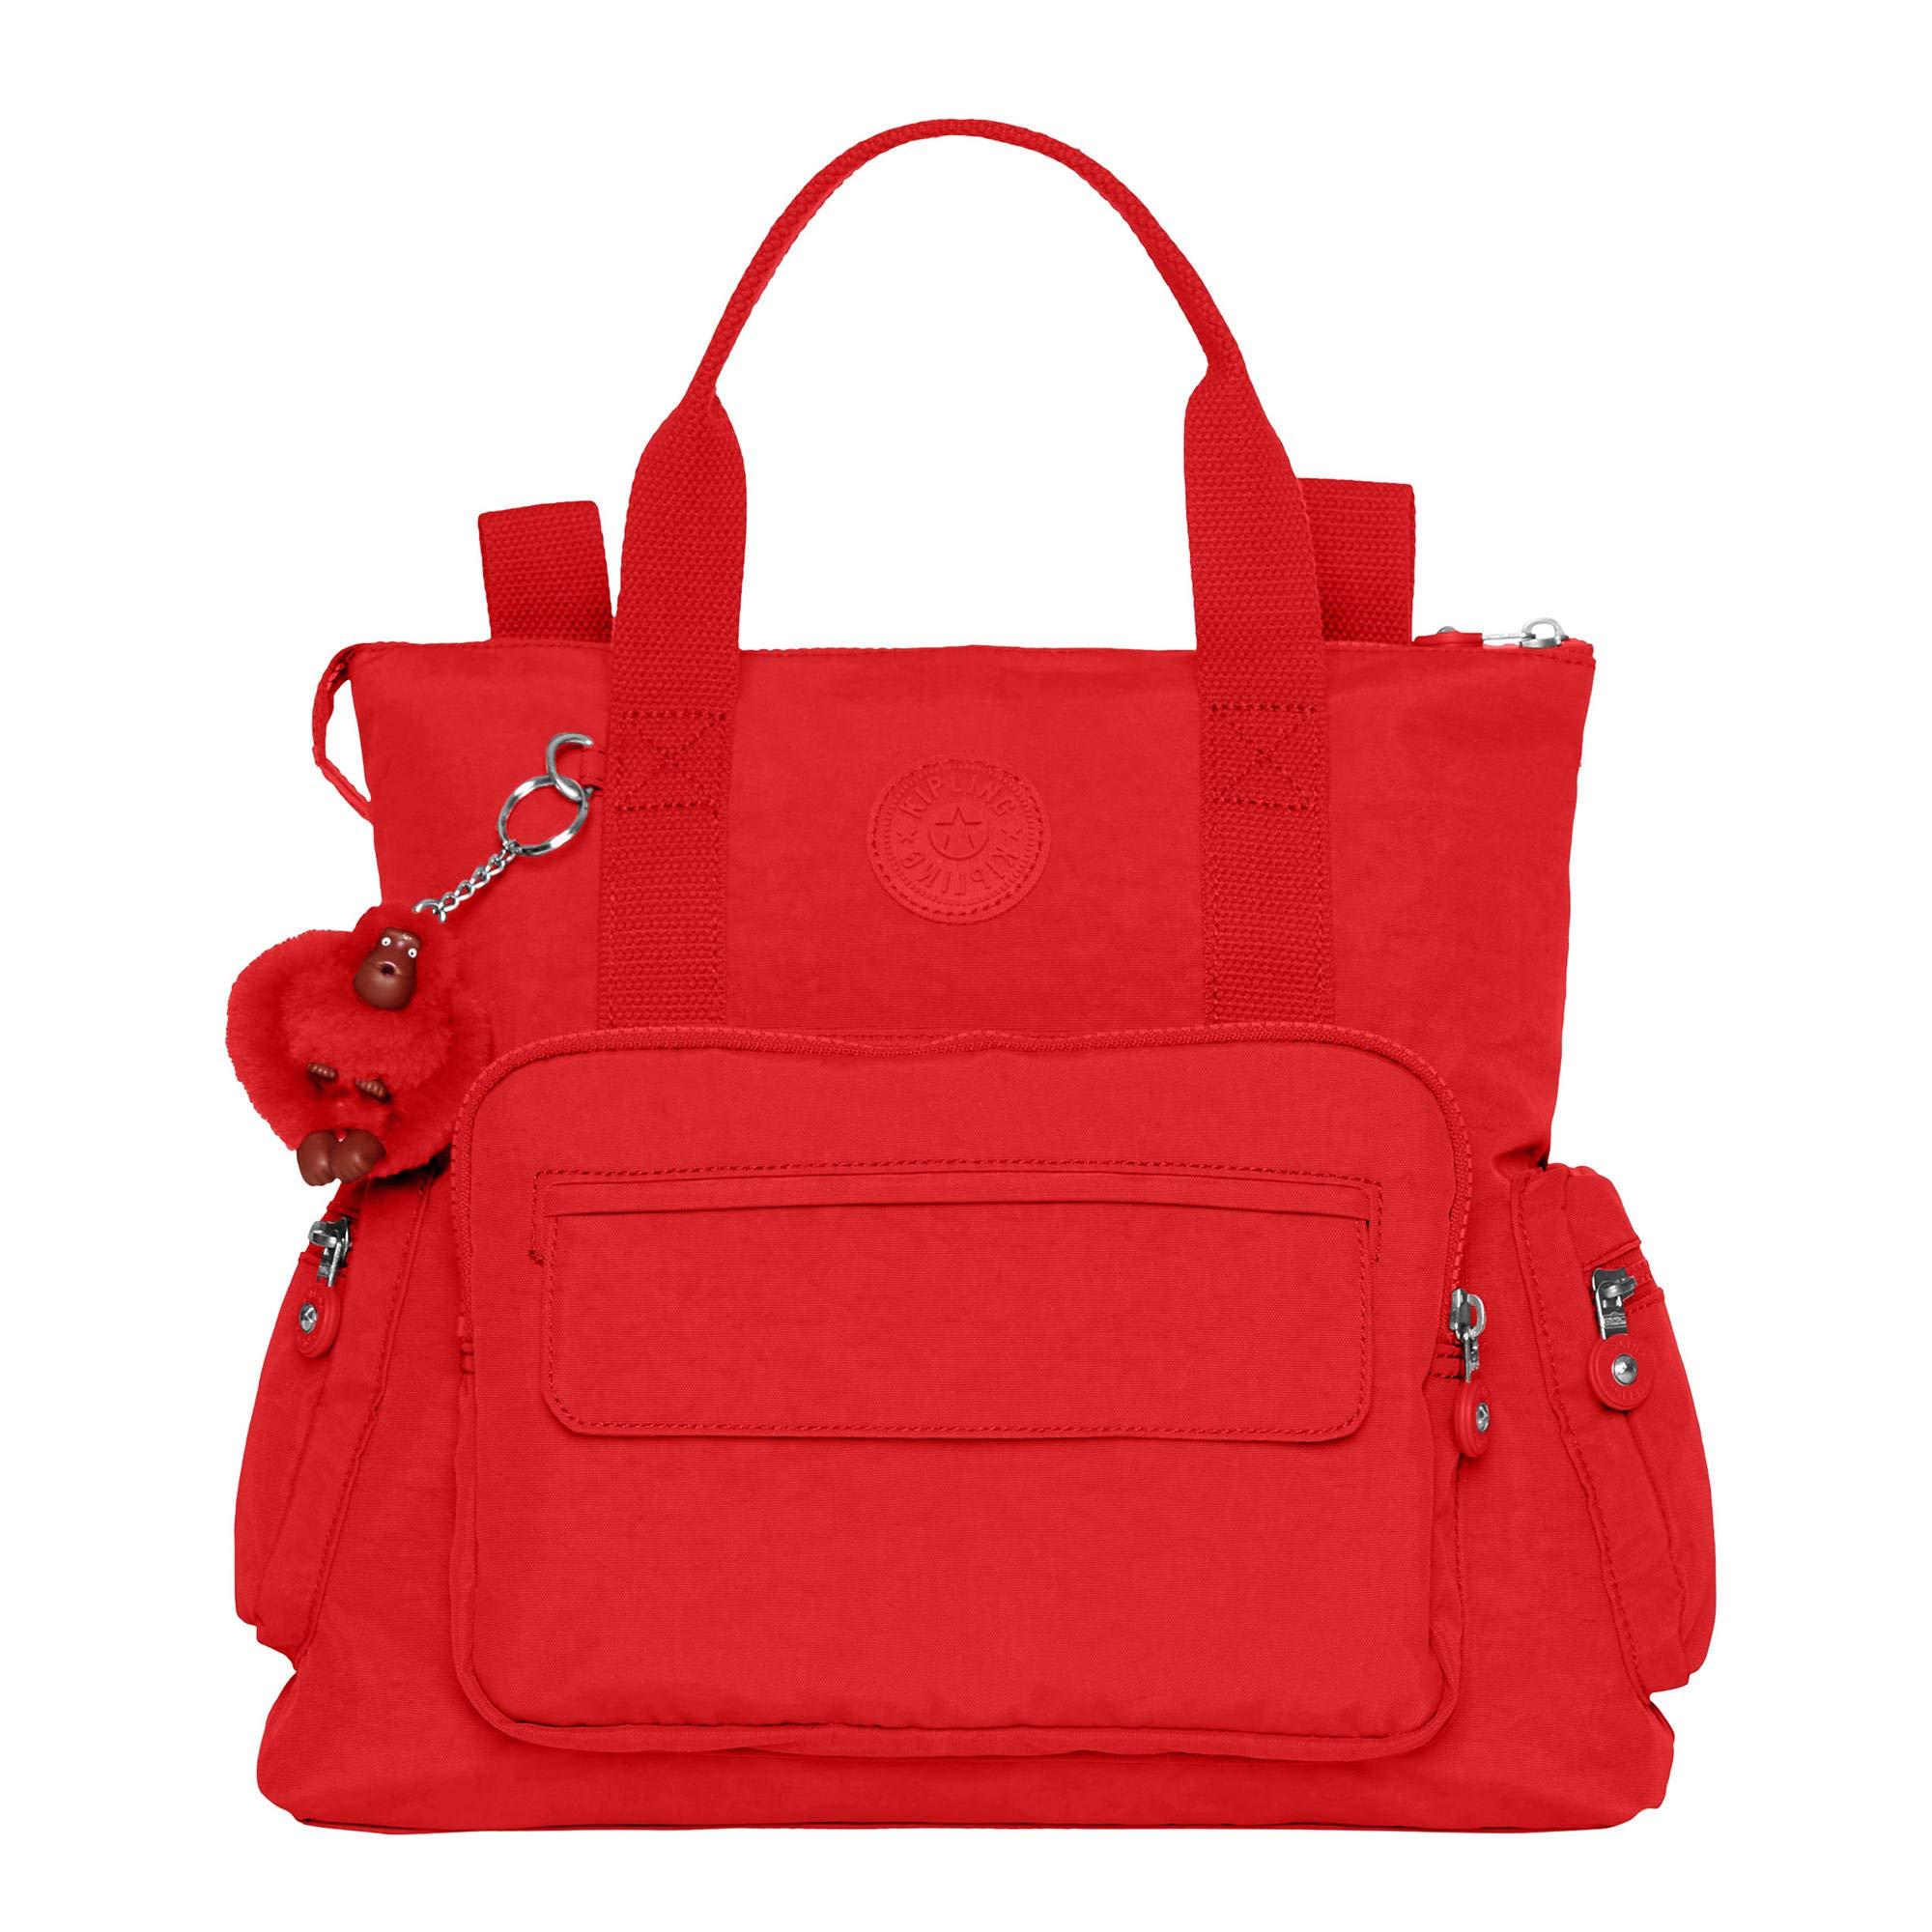 Kipling-Alvy-Black-Convertible-Handbag